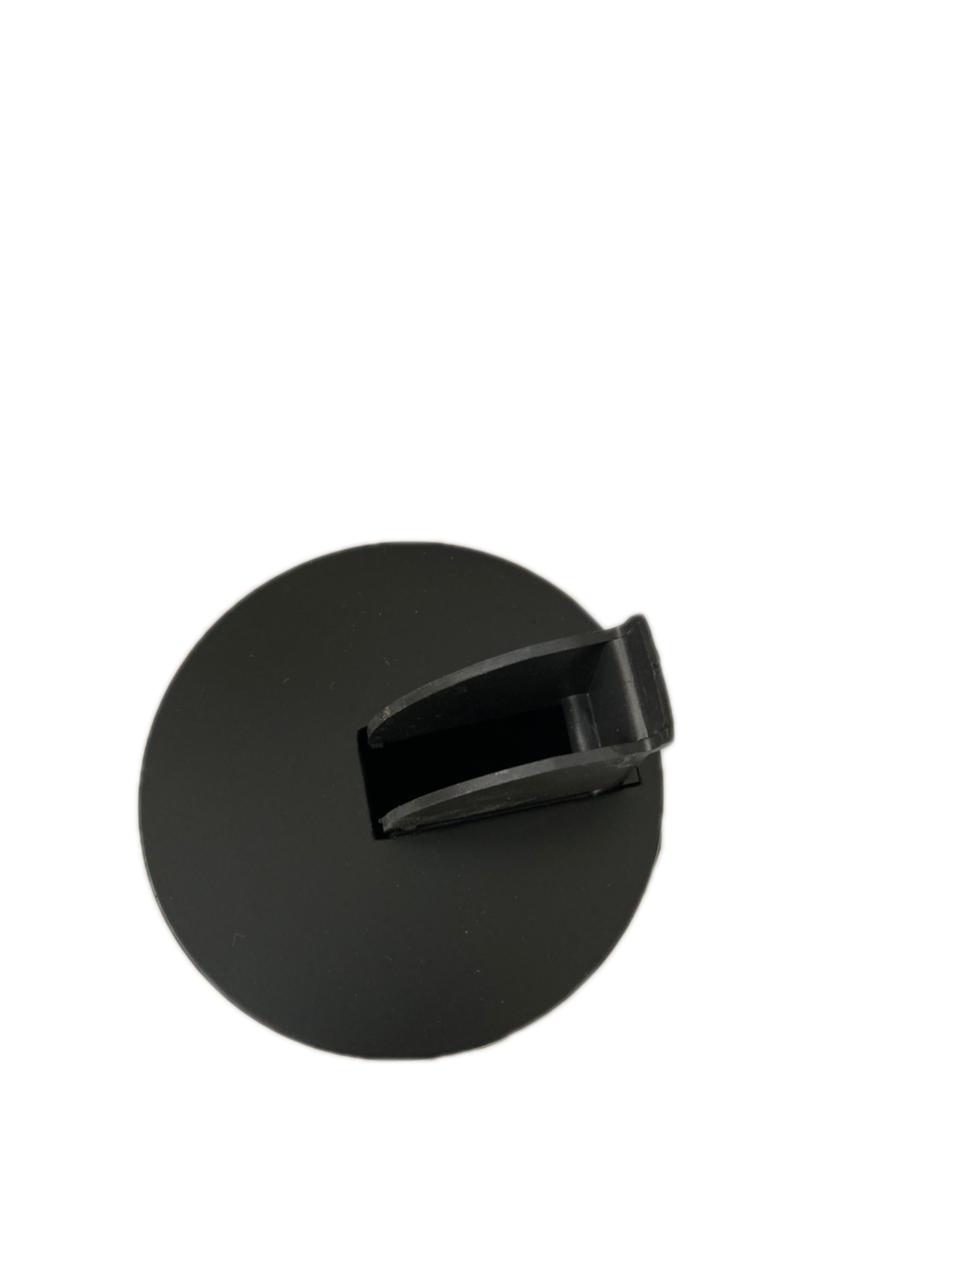 Kit Chimarrão Bolsa Feminina Marrom Matelassê Completo Exclusivo